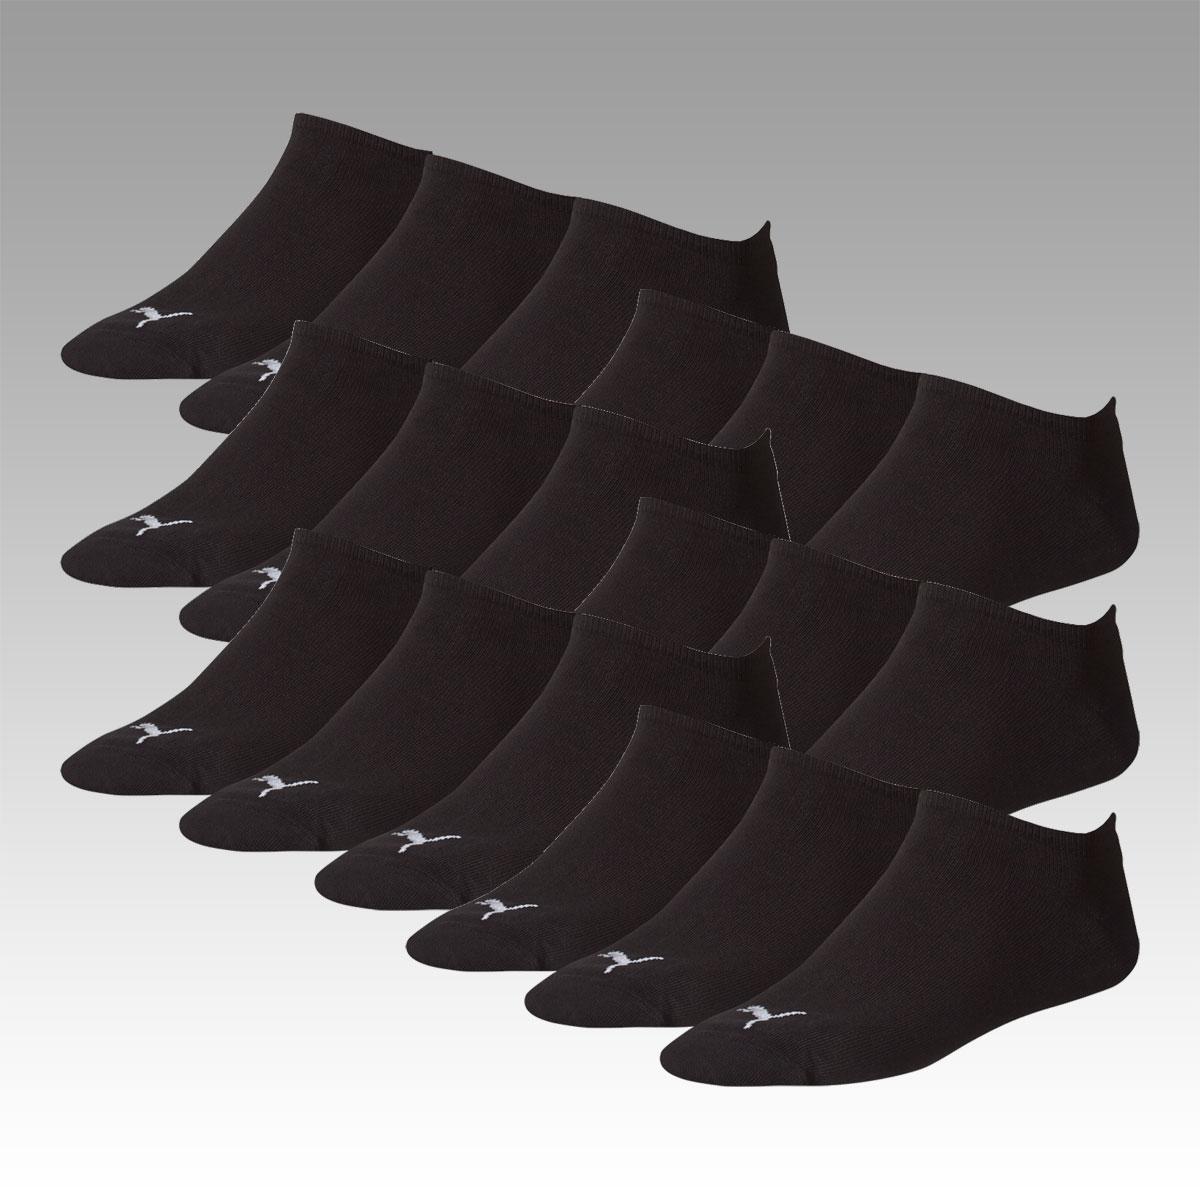 Puma Socken 18 Paar alle Varianten (Basic, Quarter usw.)